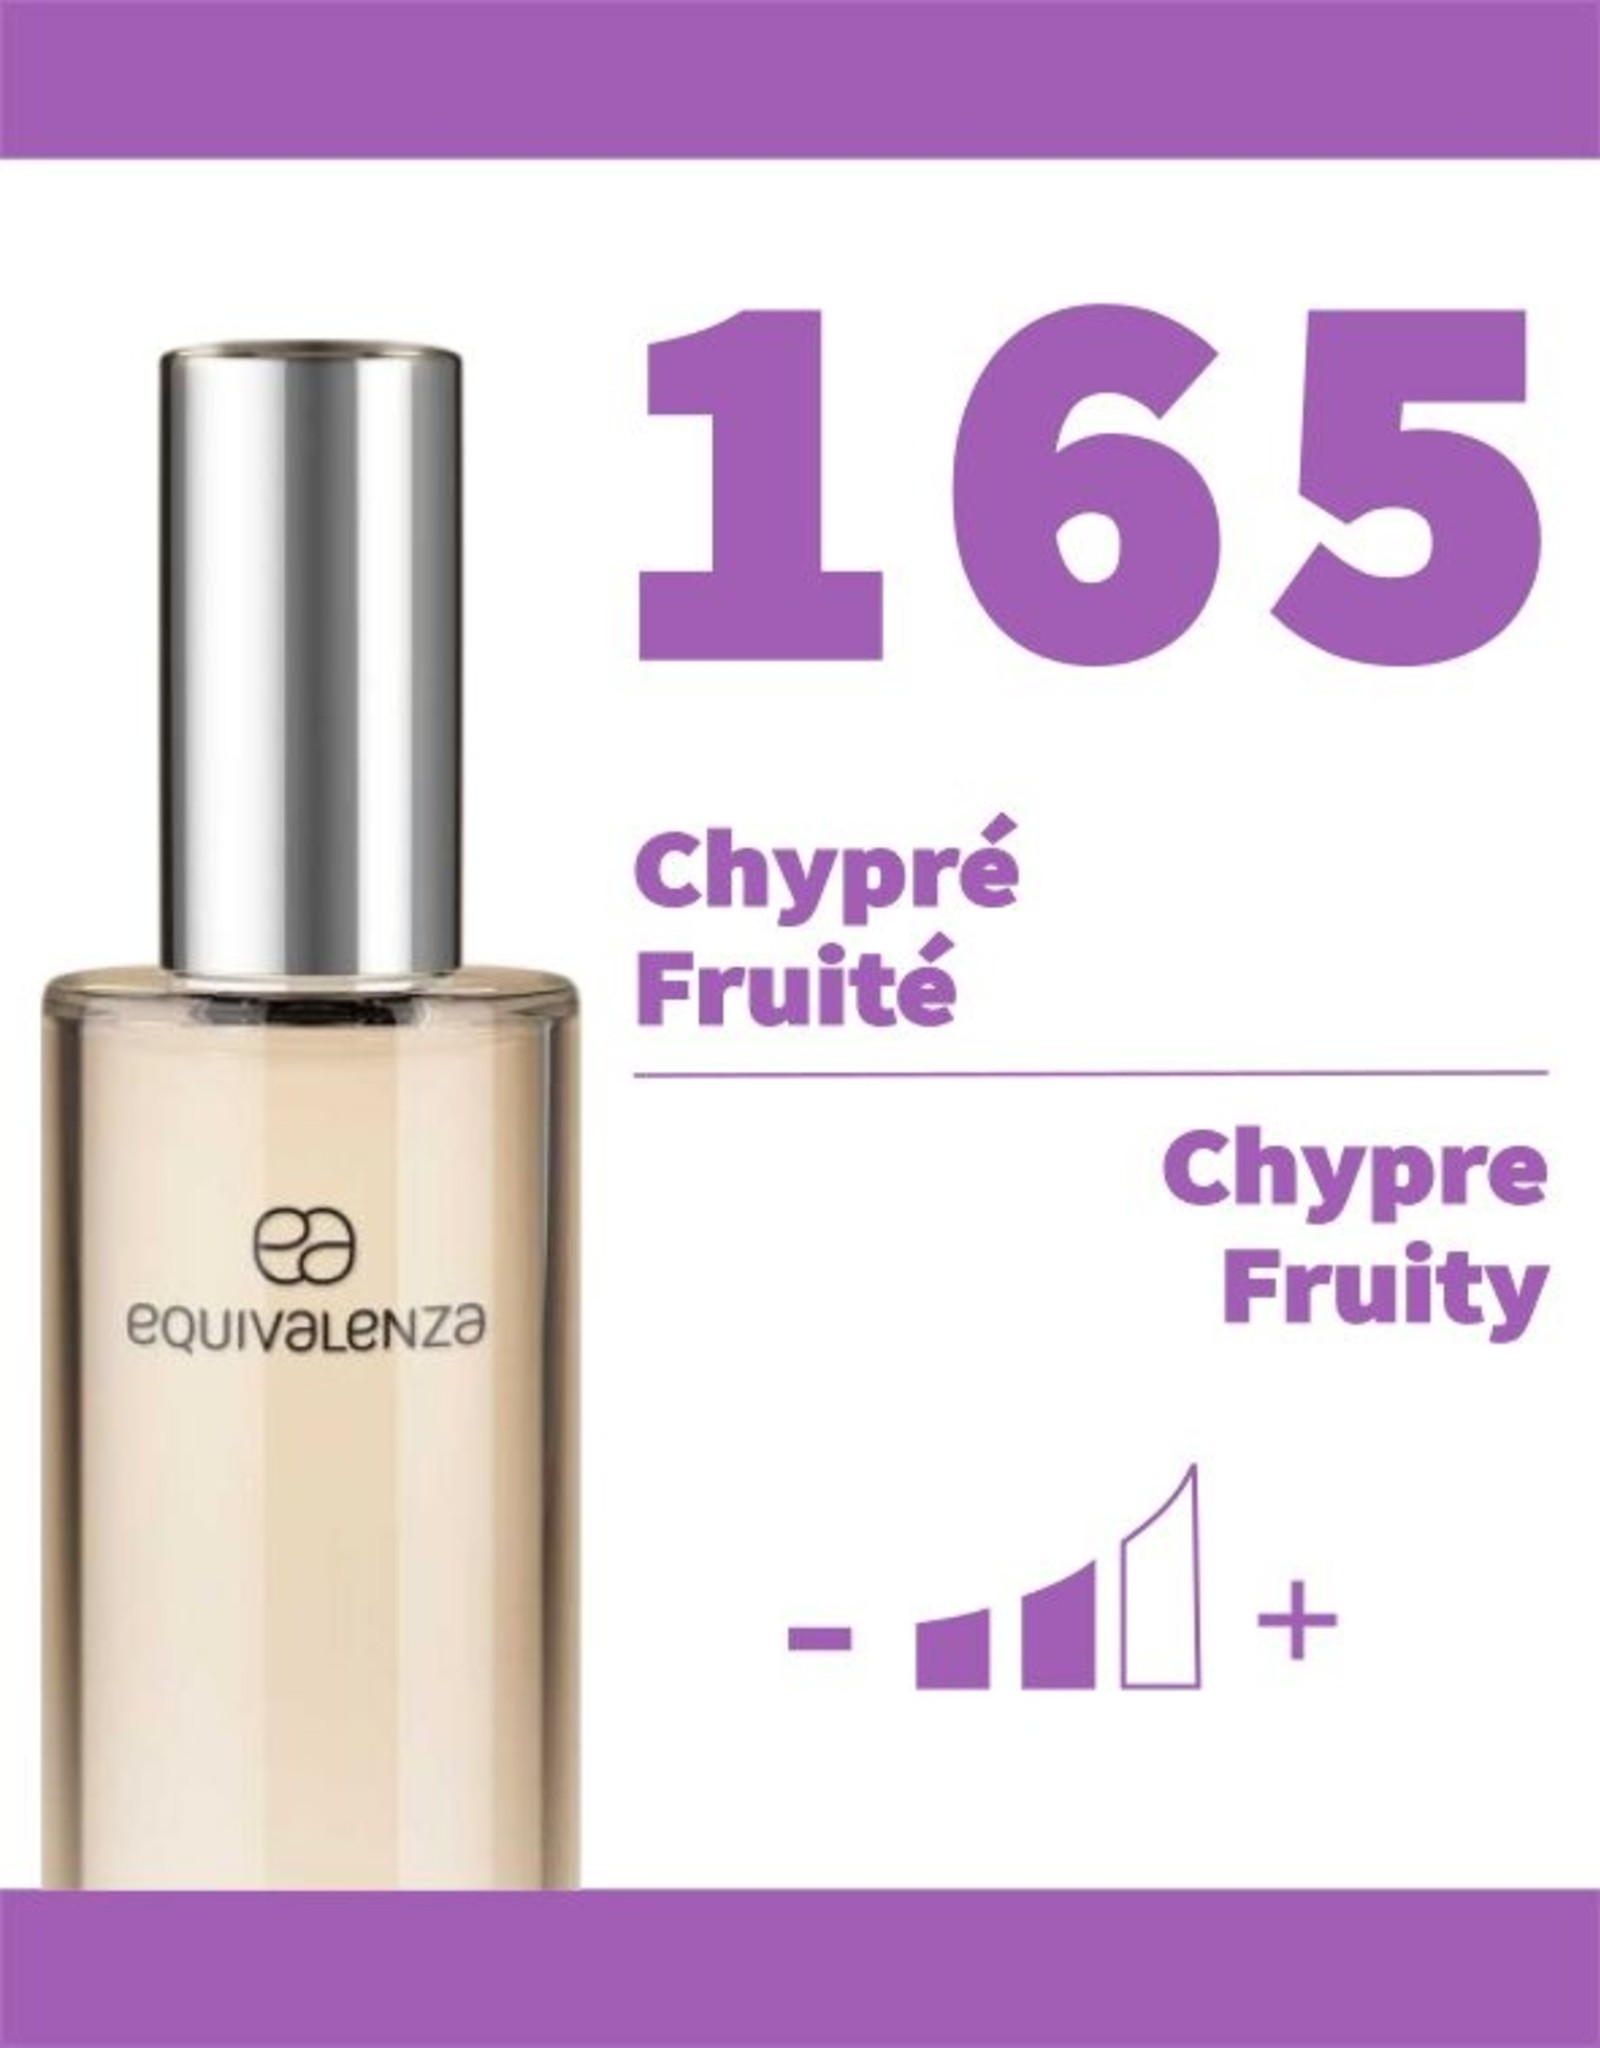 Equivalenza Chypre Fruity 165